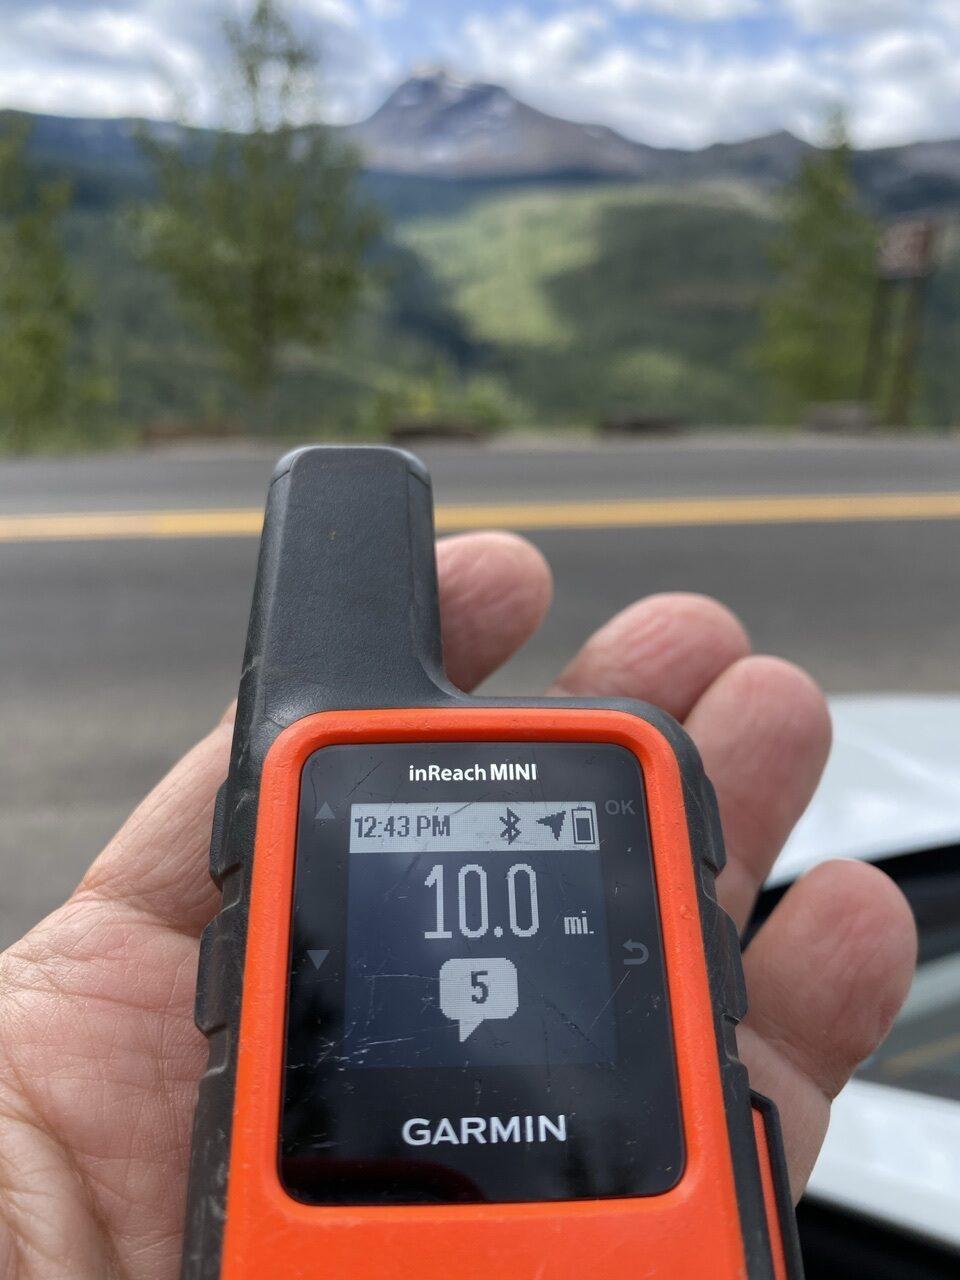 Garmin GSP tracking device